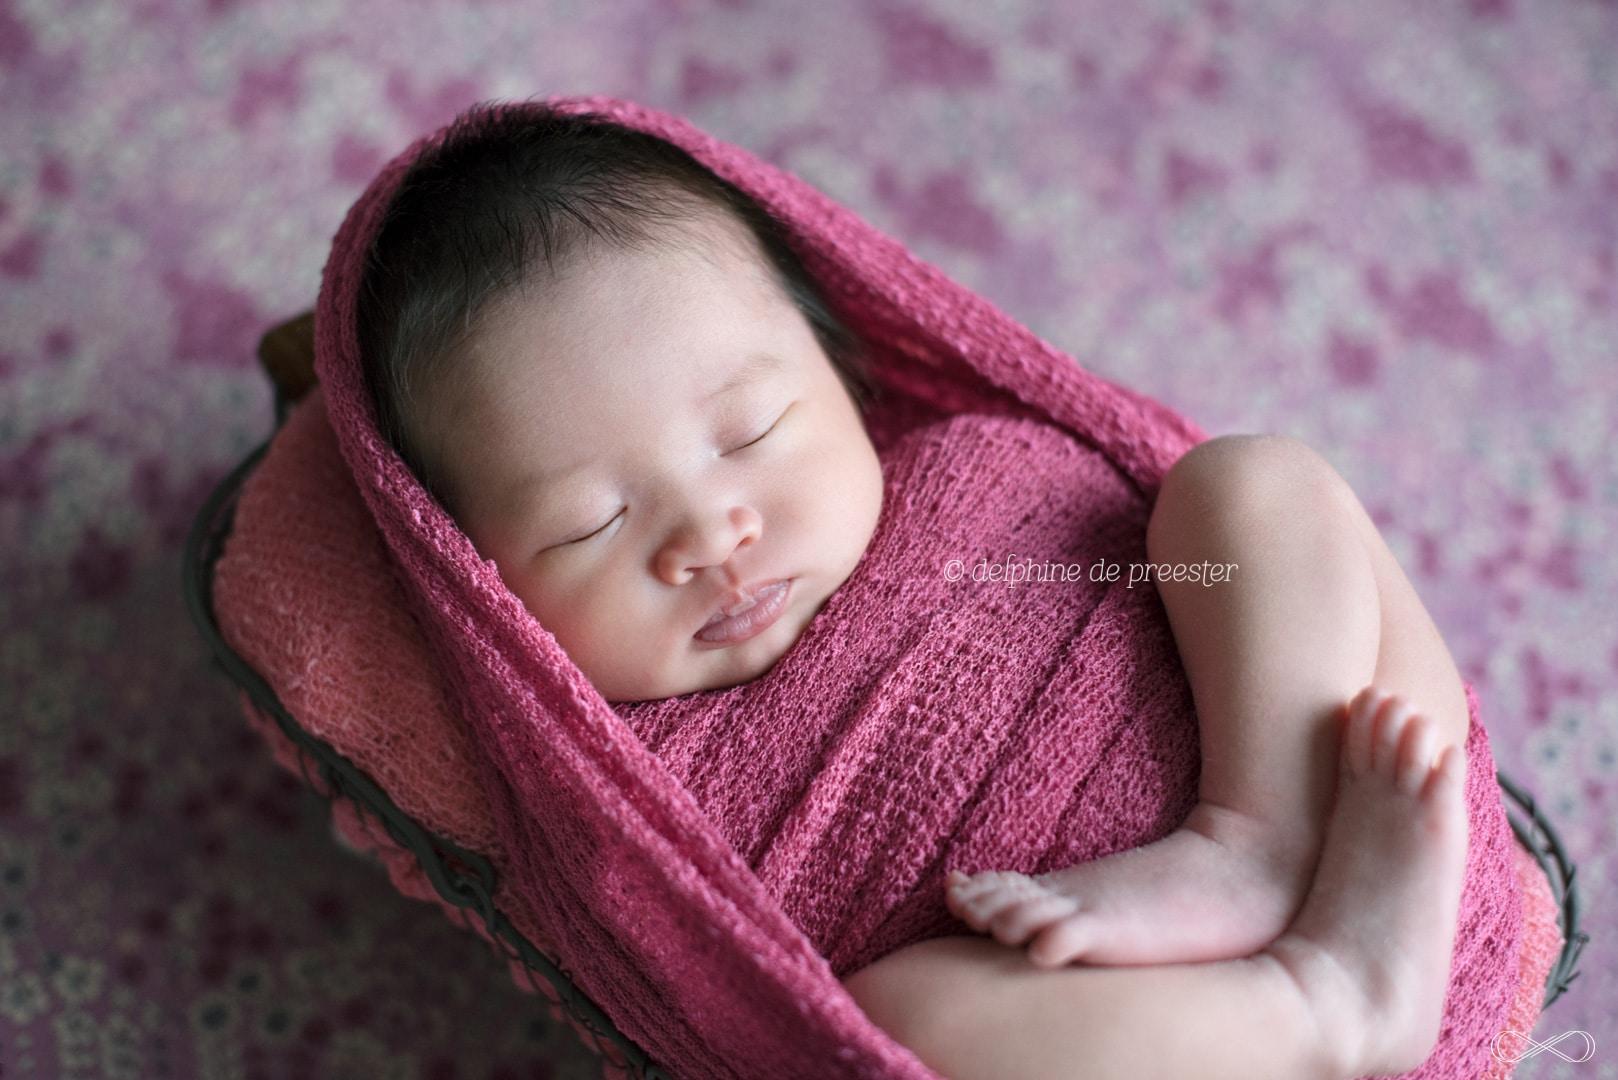 photos bébé emmailloté